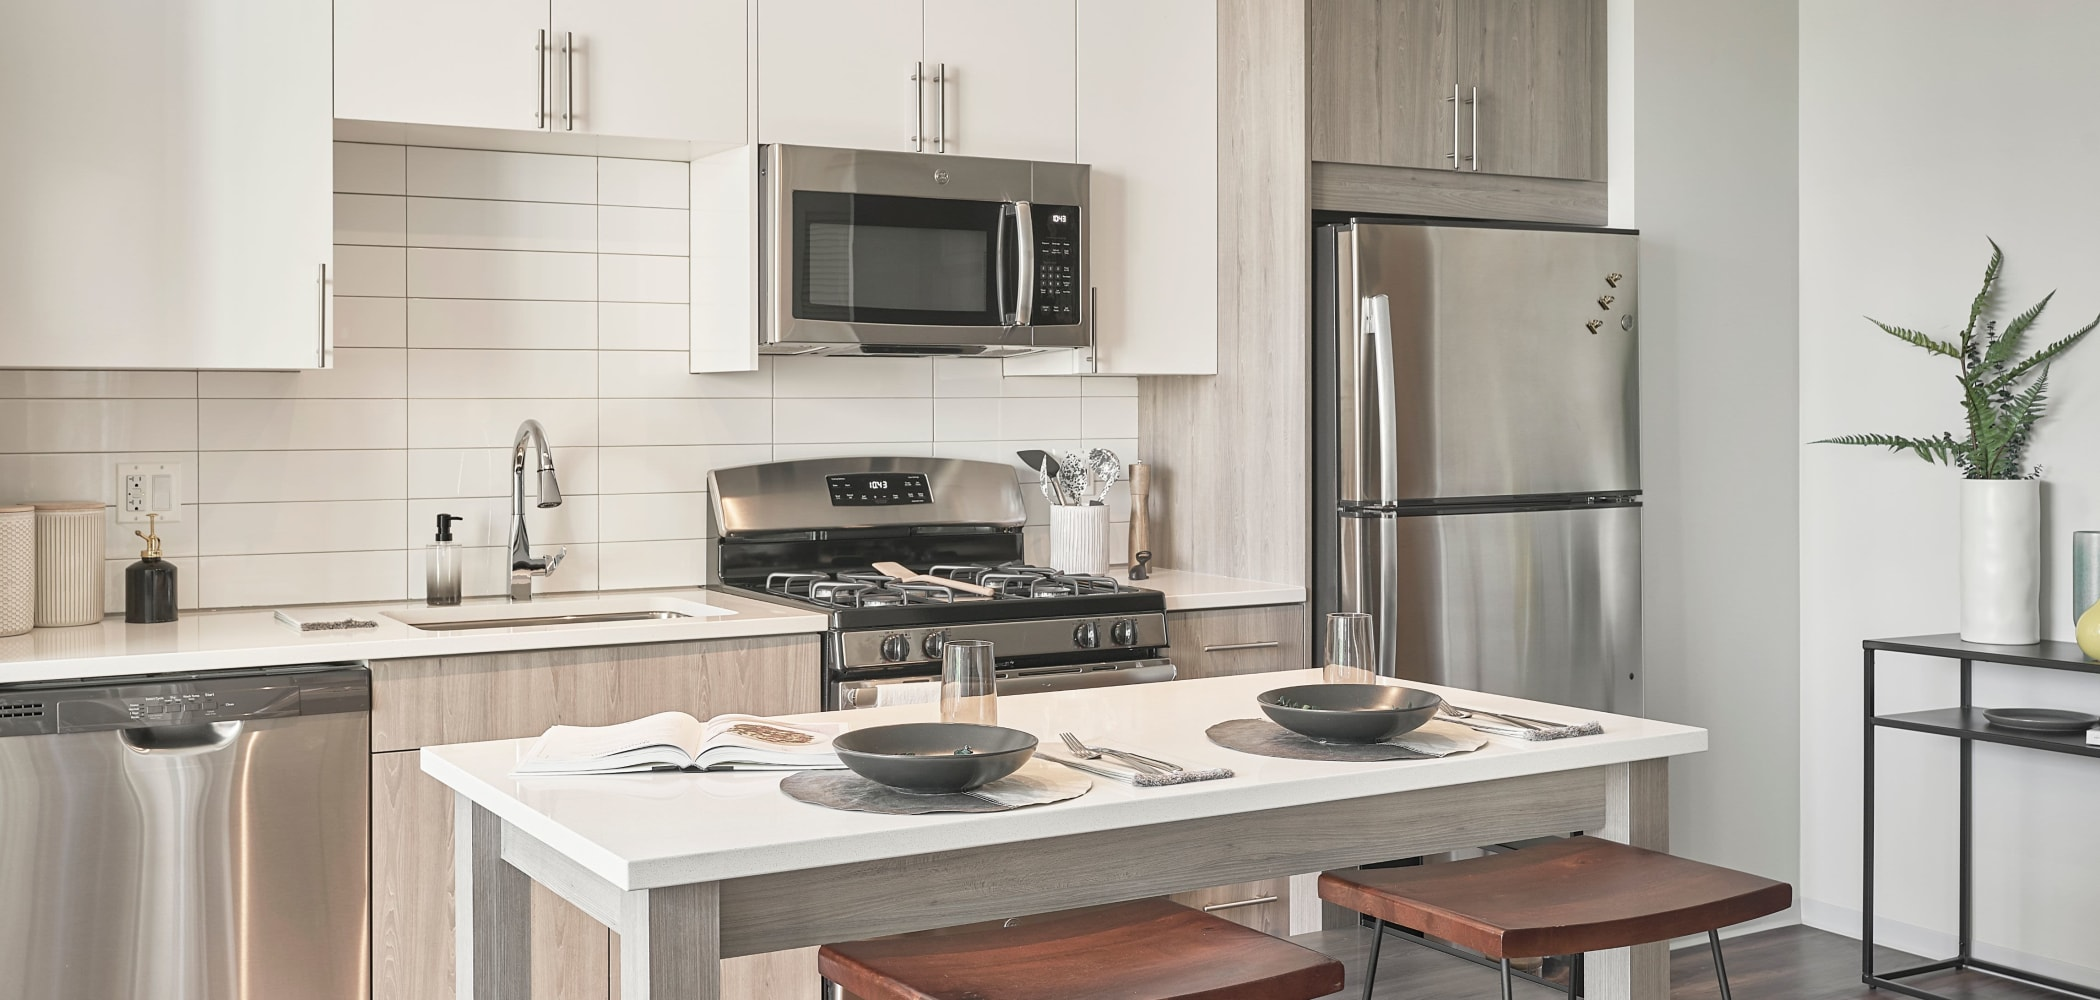 Sleek, modern kitchen at The Link Evanston in Evanston, Illinois